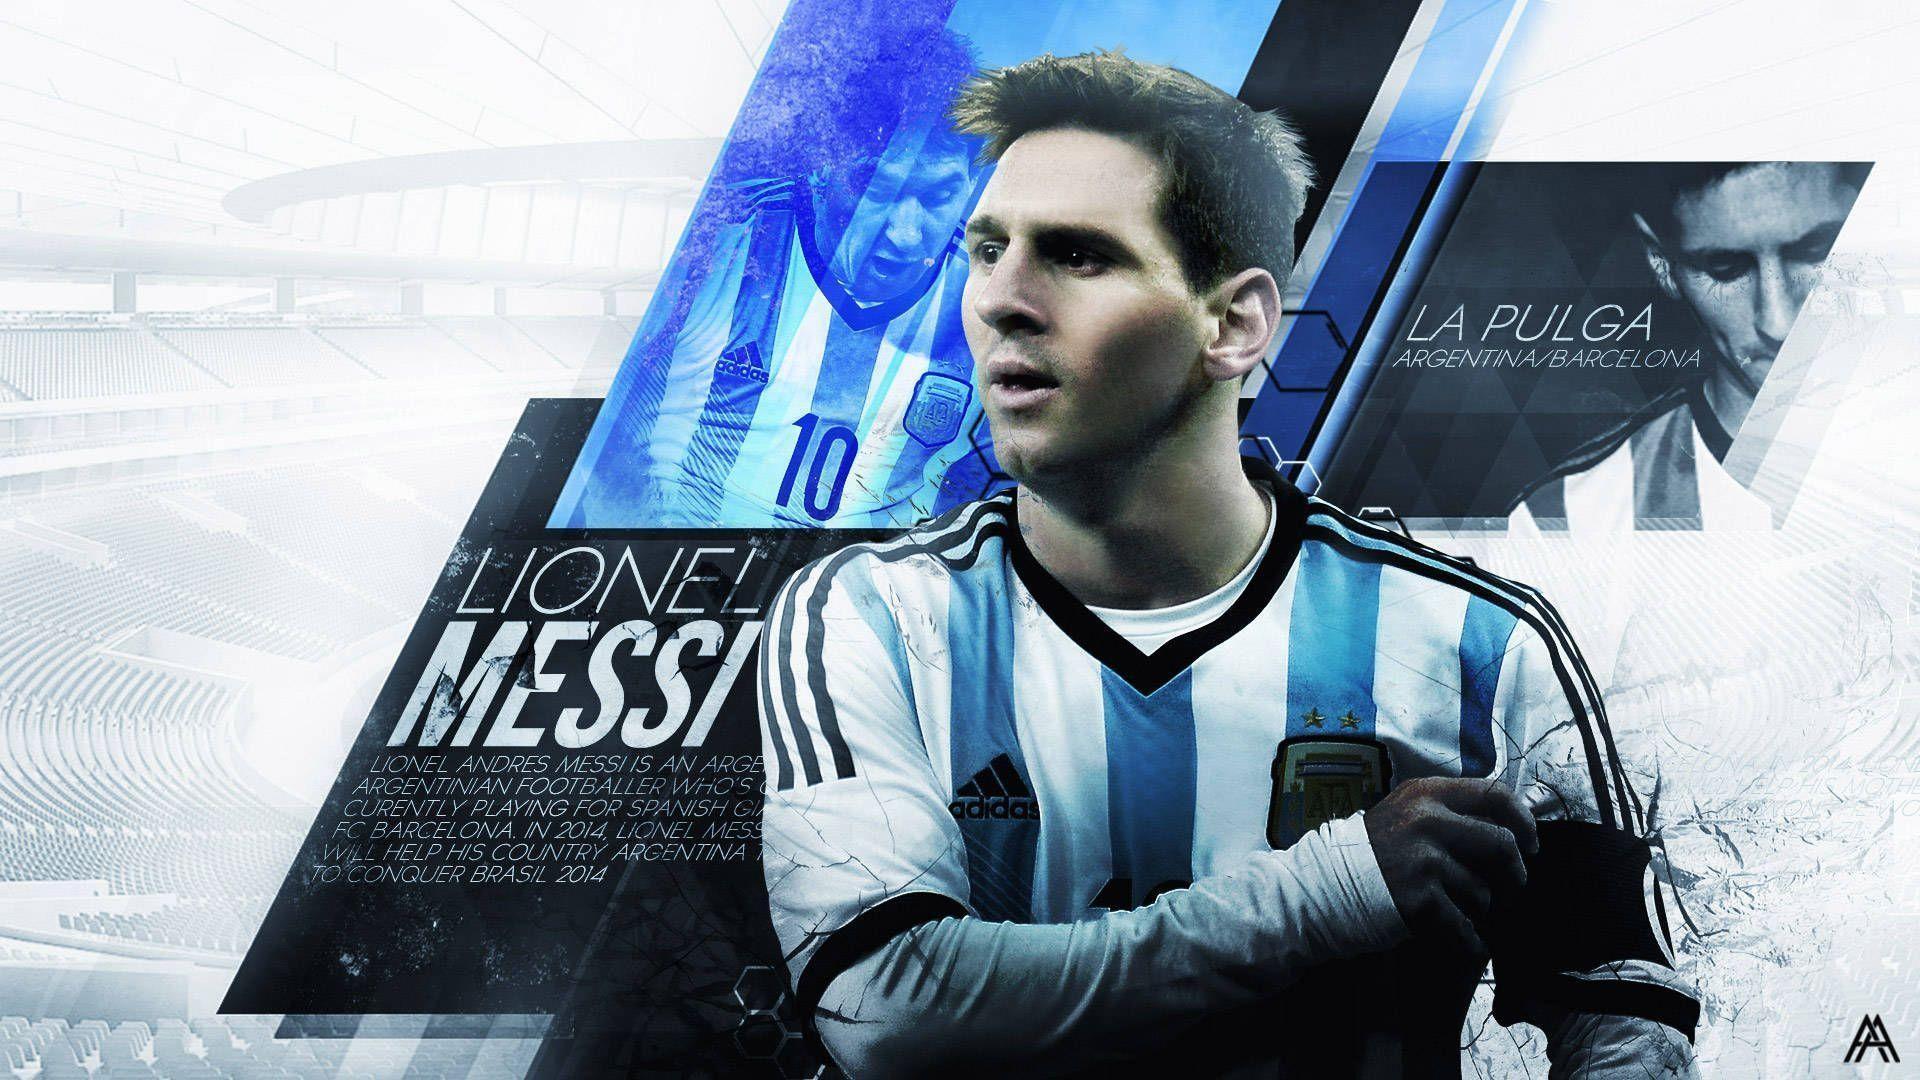 Lionel Messi Wallpaper HD – Soccer Desktop